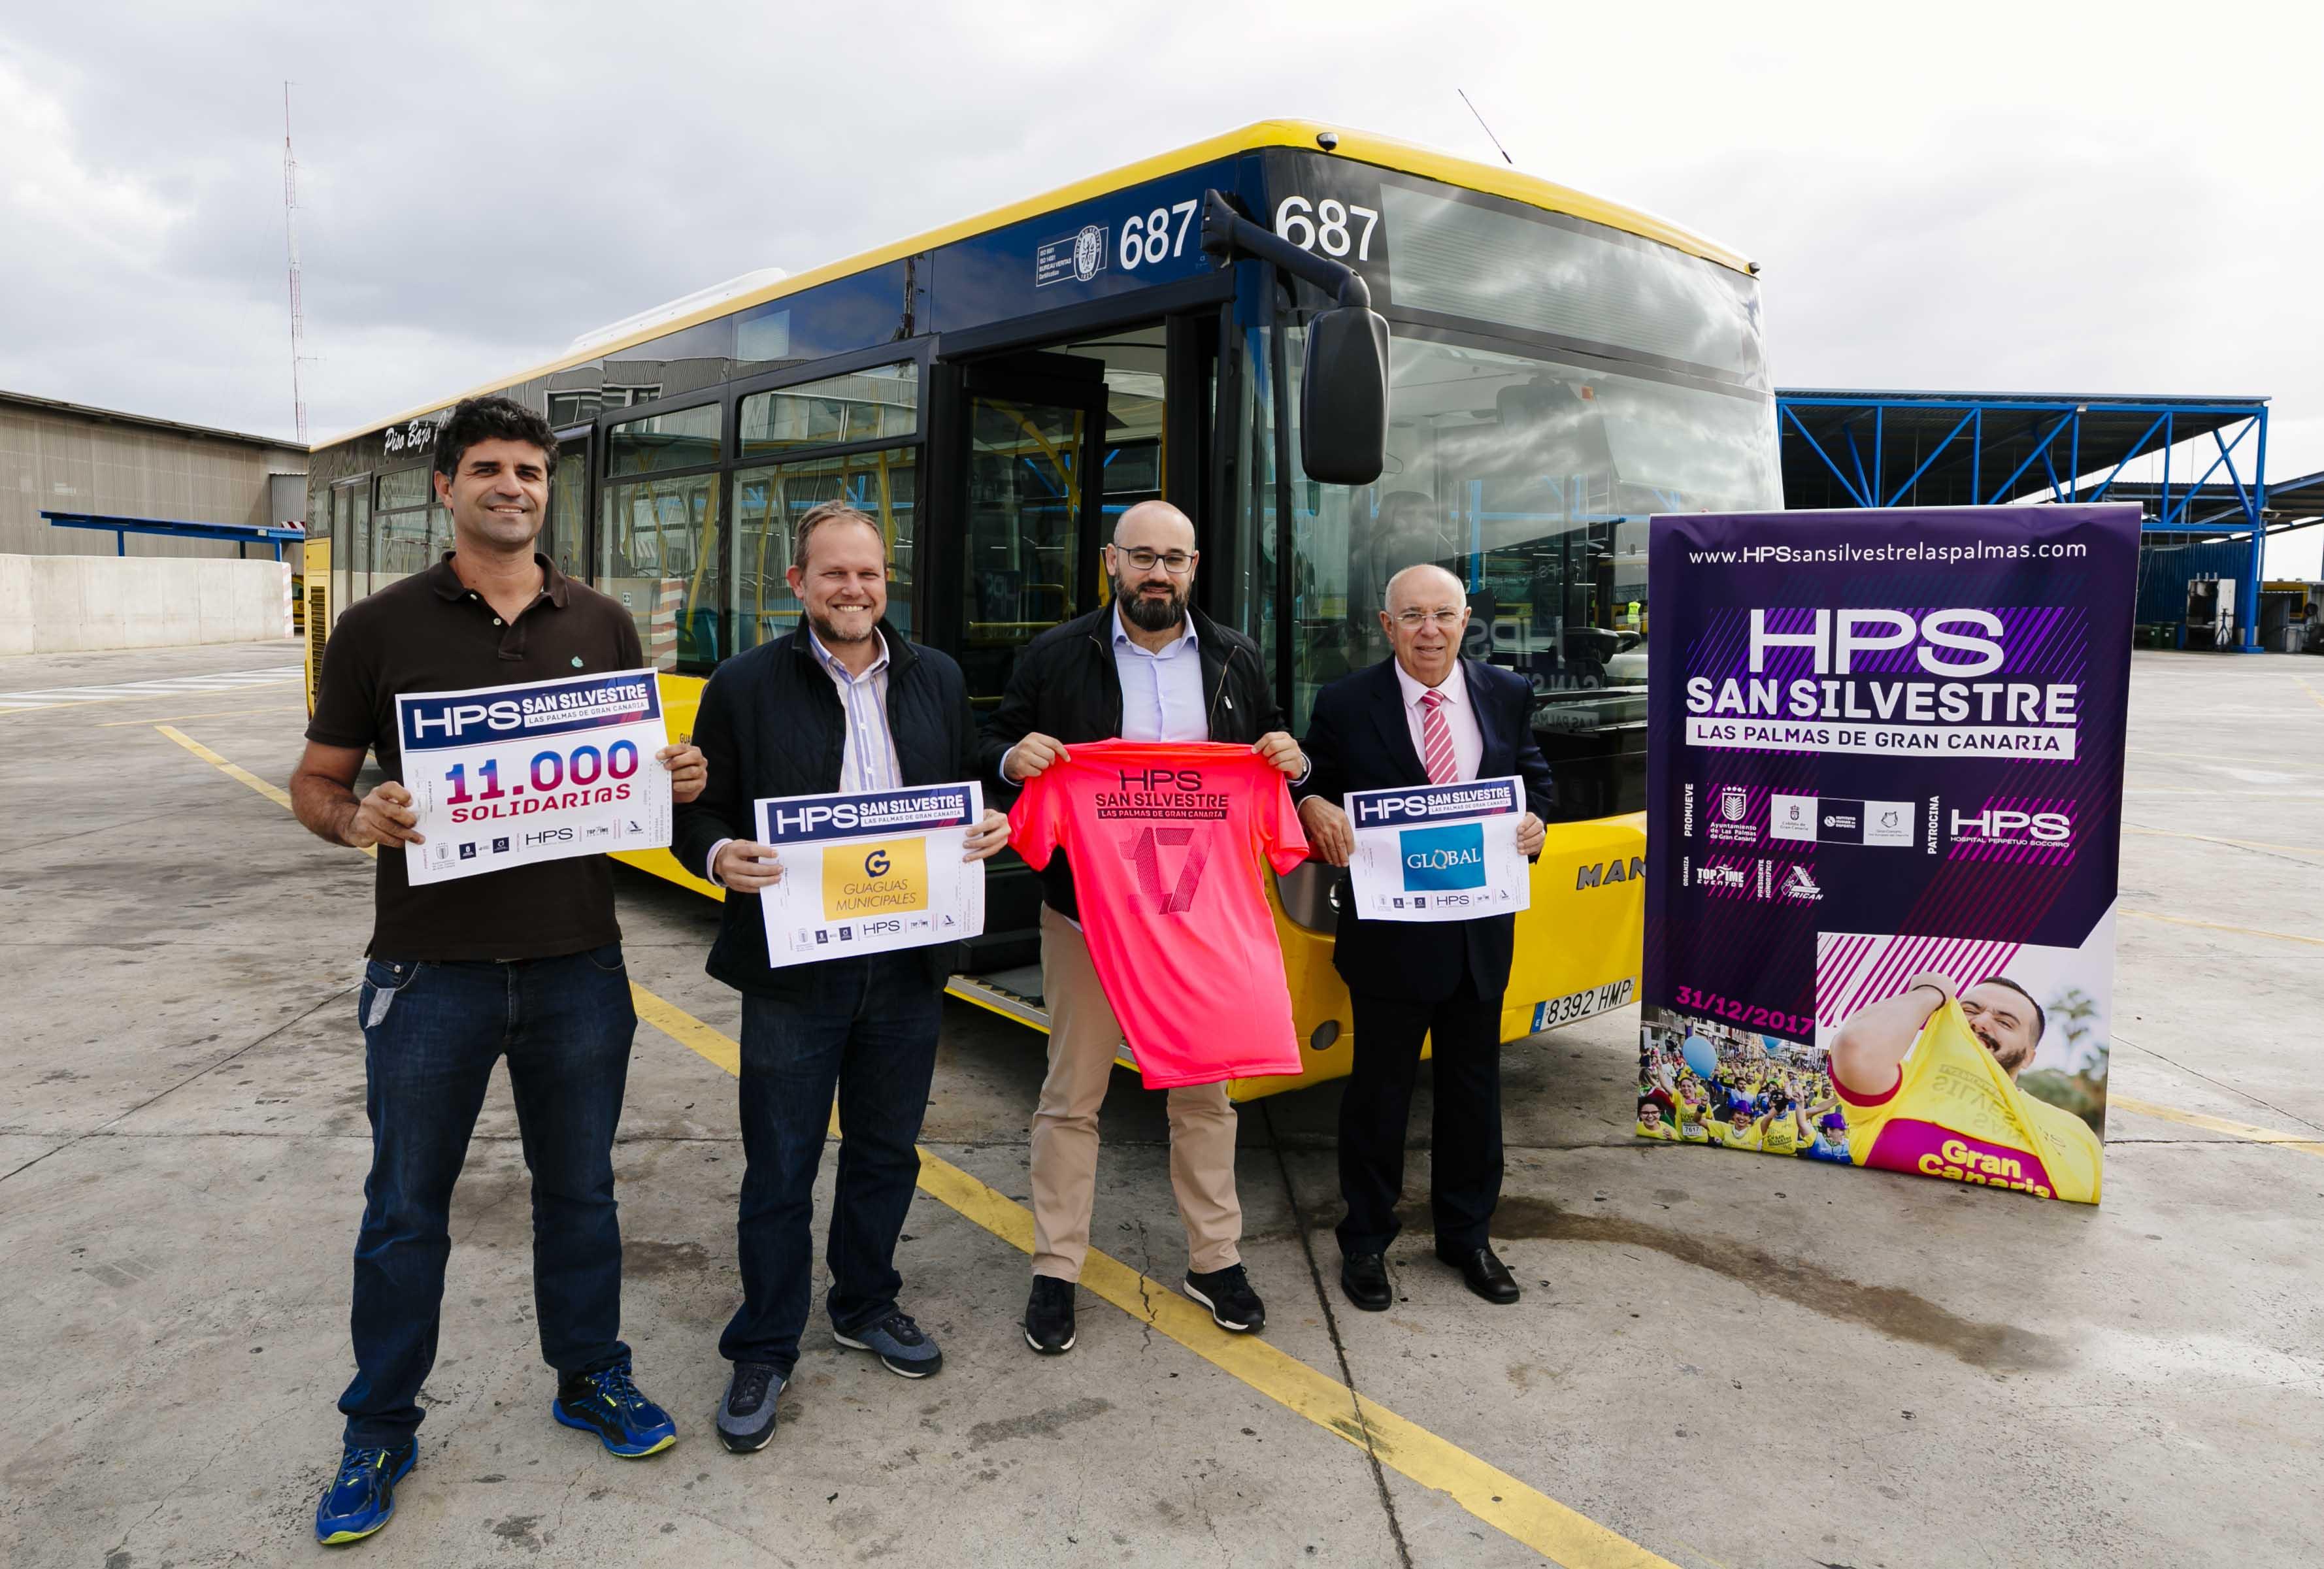 Guaguas Municipales ofrece transporte gratuito a los corredores de la HPS San Silvestre